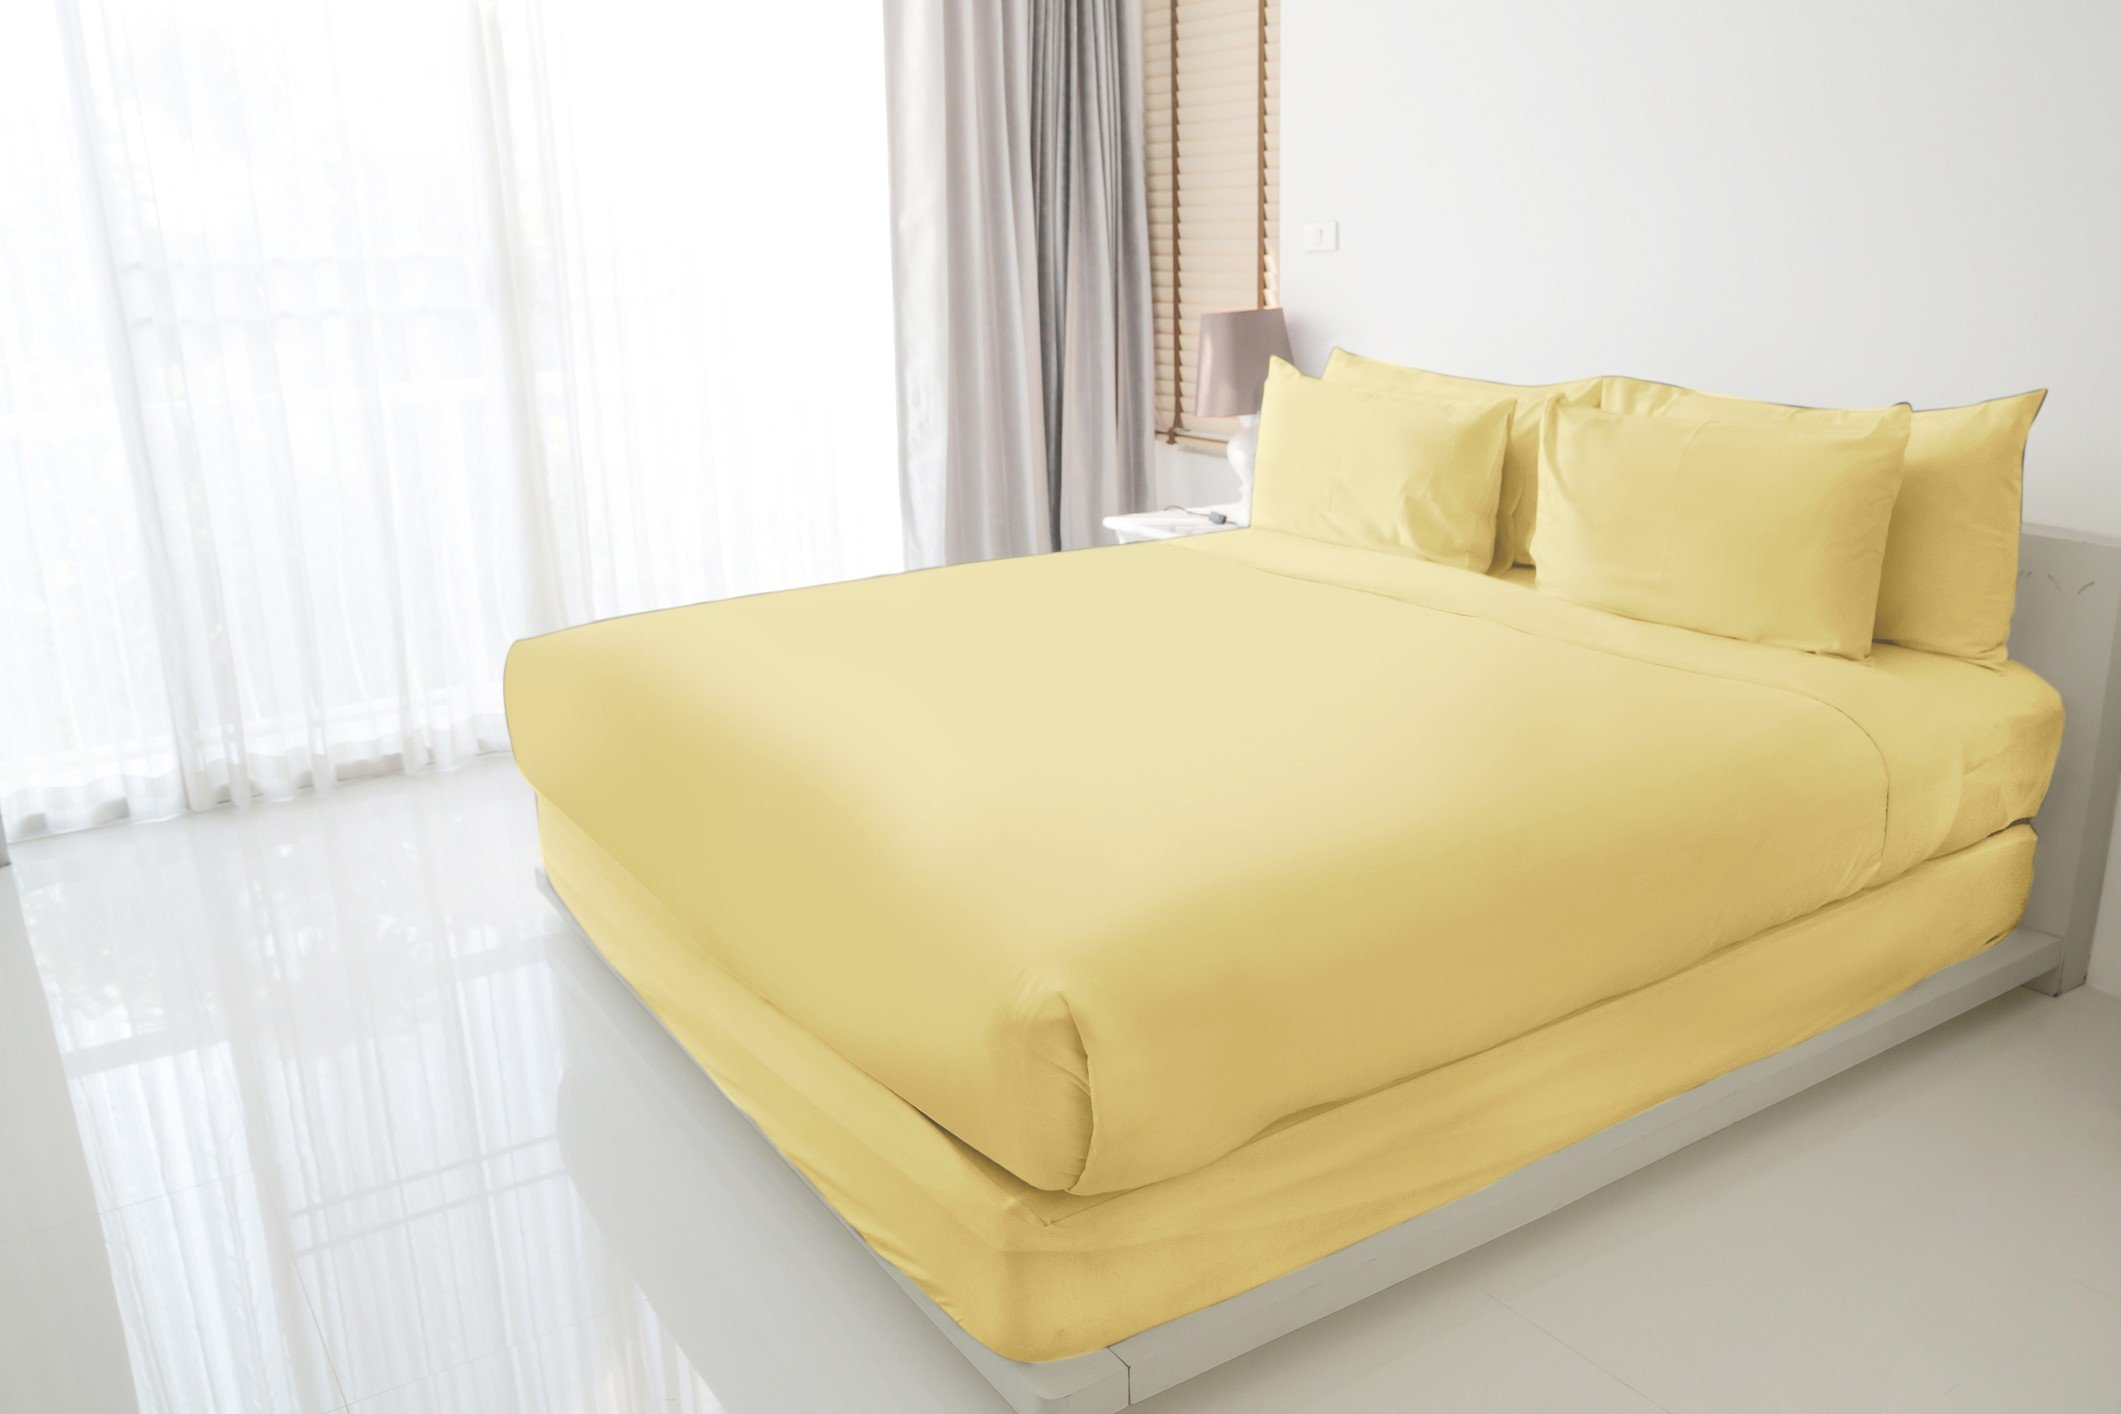 Luxuress 100% Long Staple Soft Cotton Sheet Set, Smooth Sateen Weave, 4 Piece Set, QUEEN SHEETS, 15'' Deep Pocket, Luxury Hotel Quality, SAFFRON